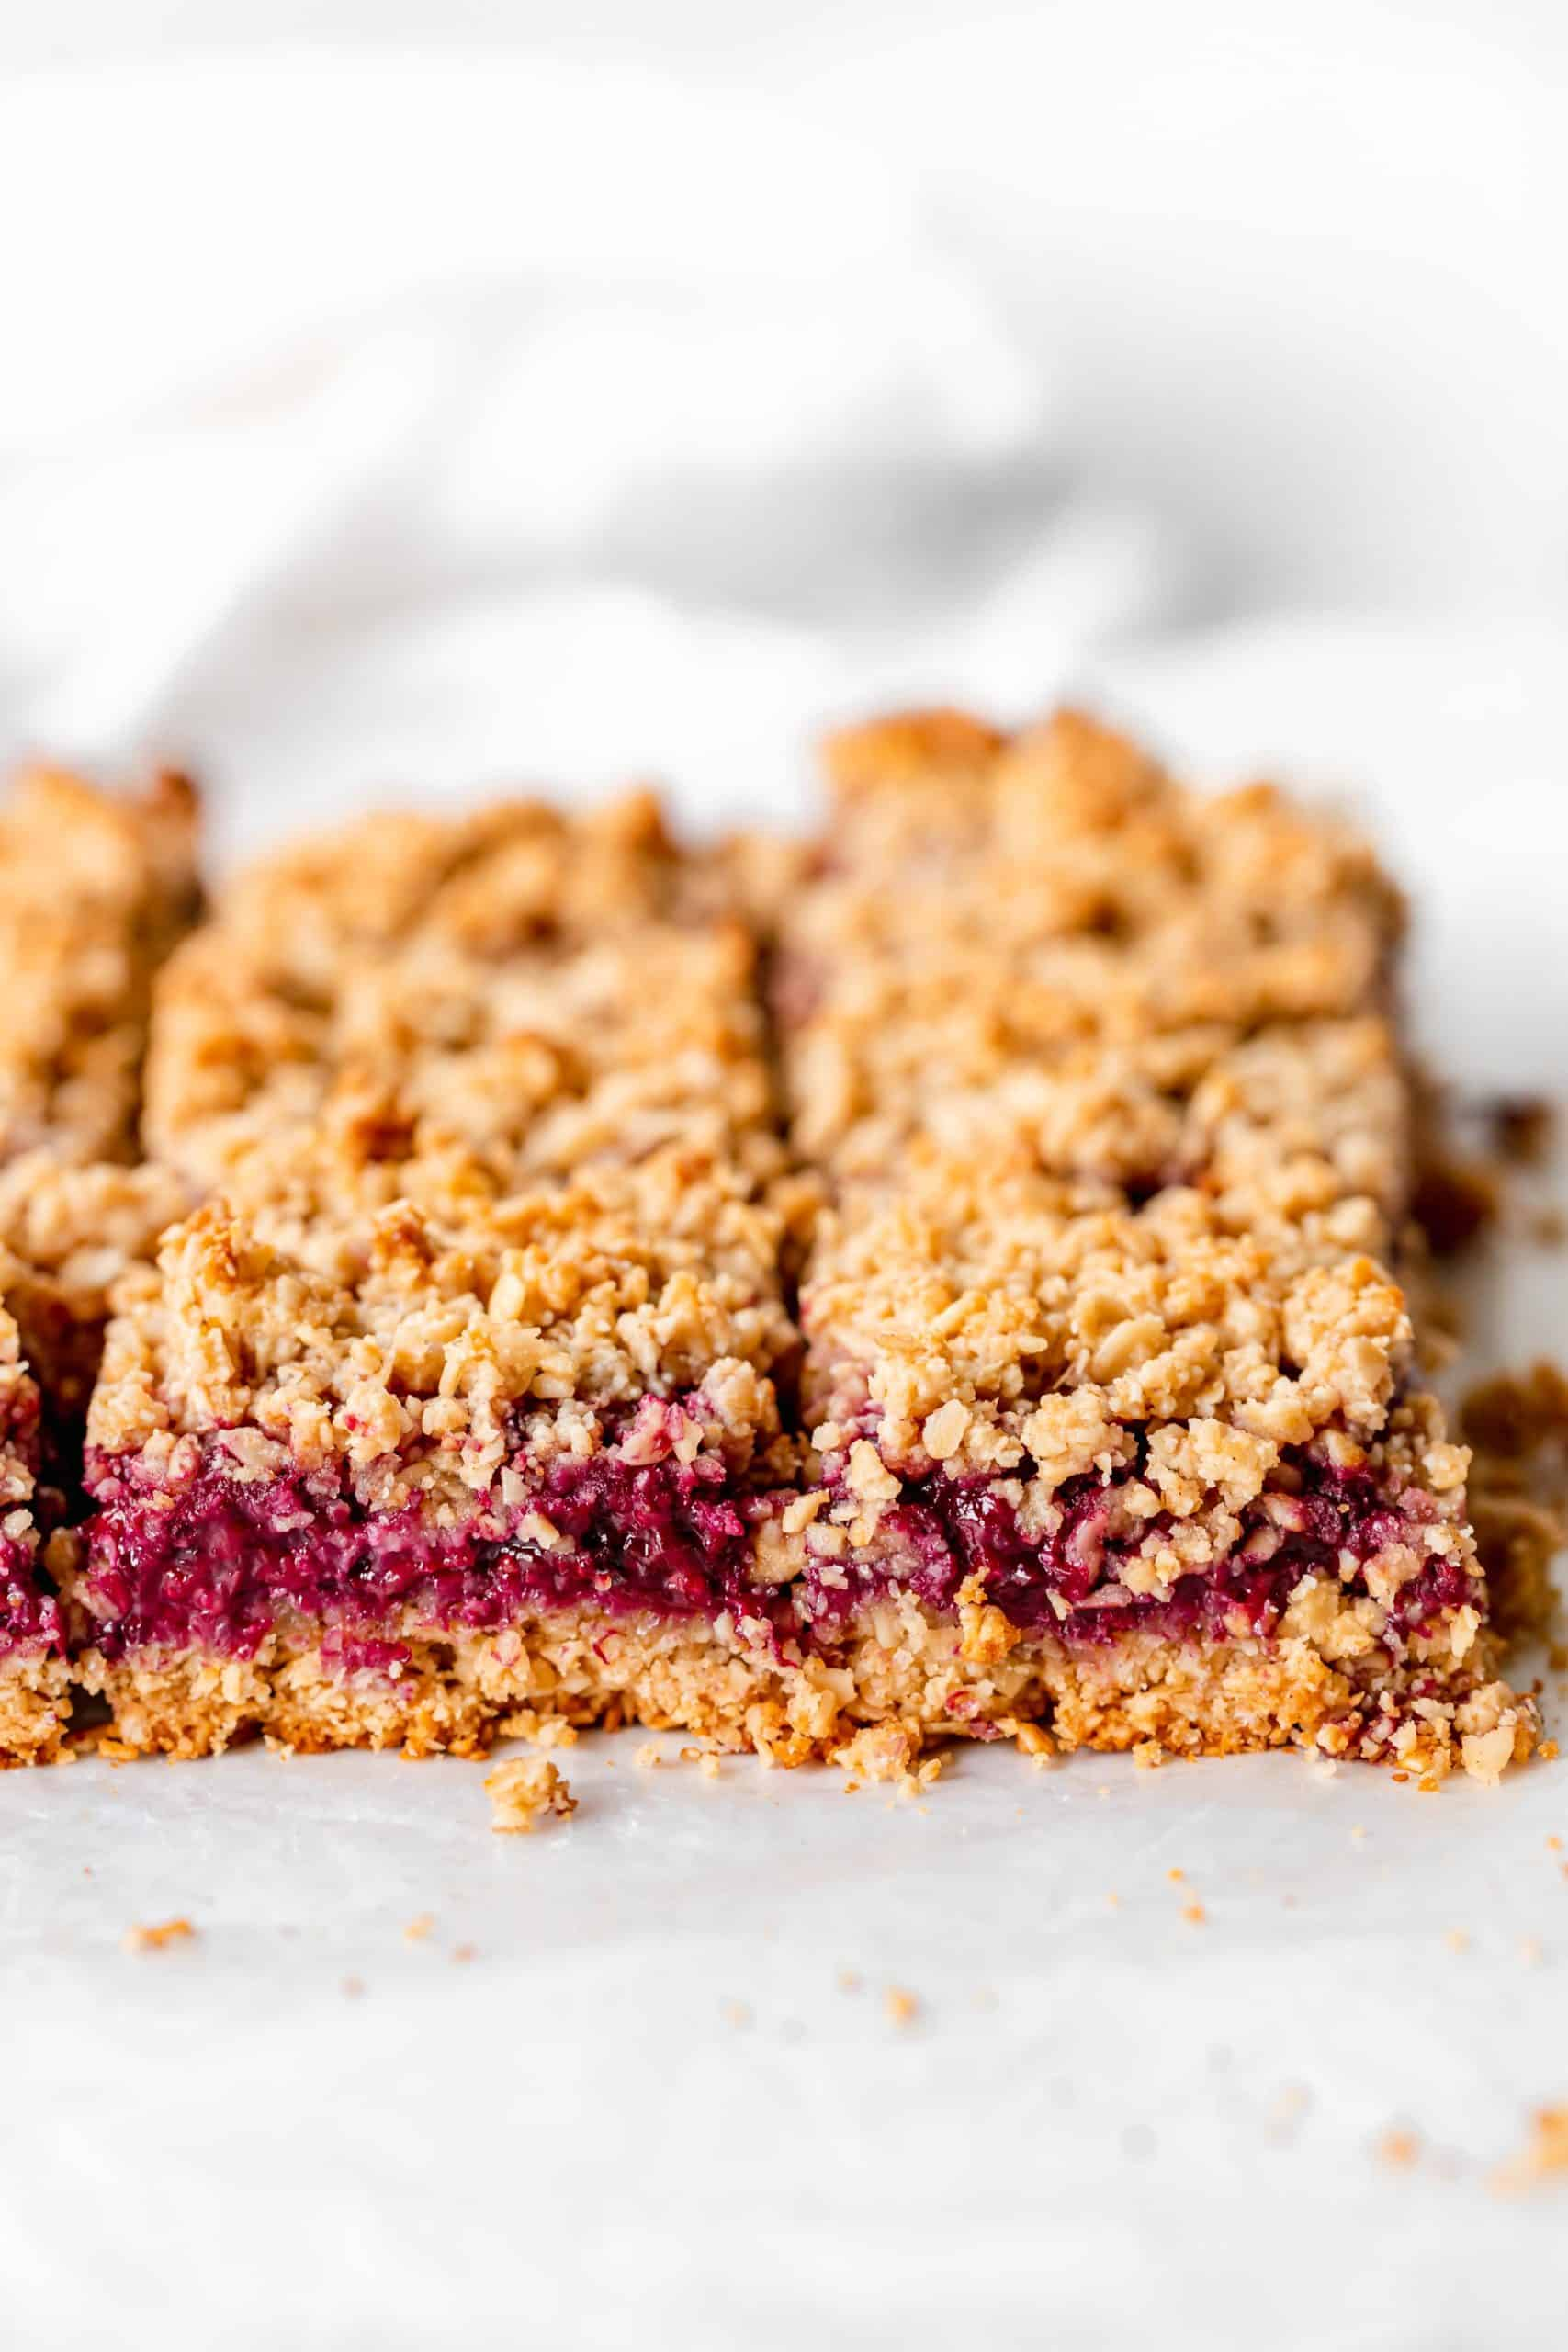 Vegan blackberry crumb bars on parchment paper